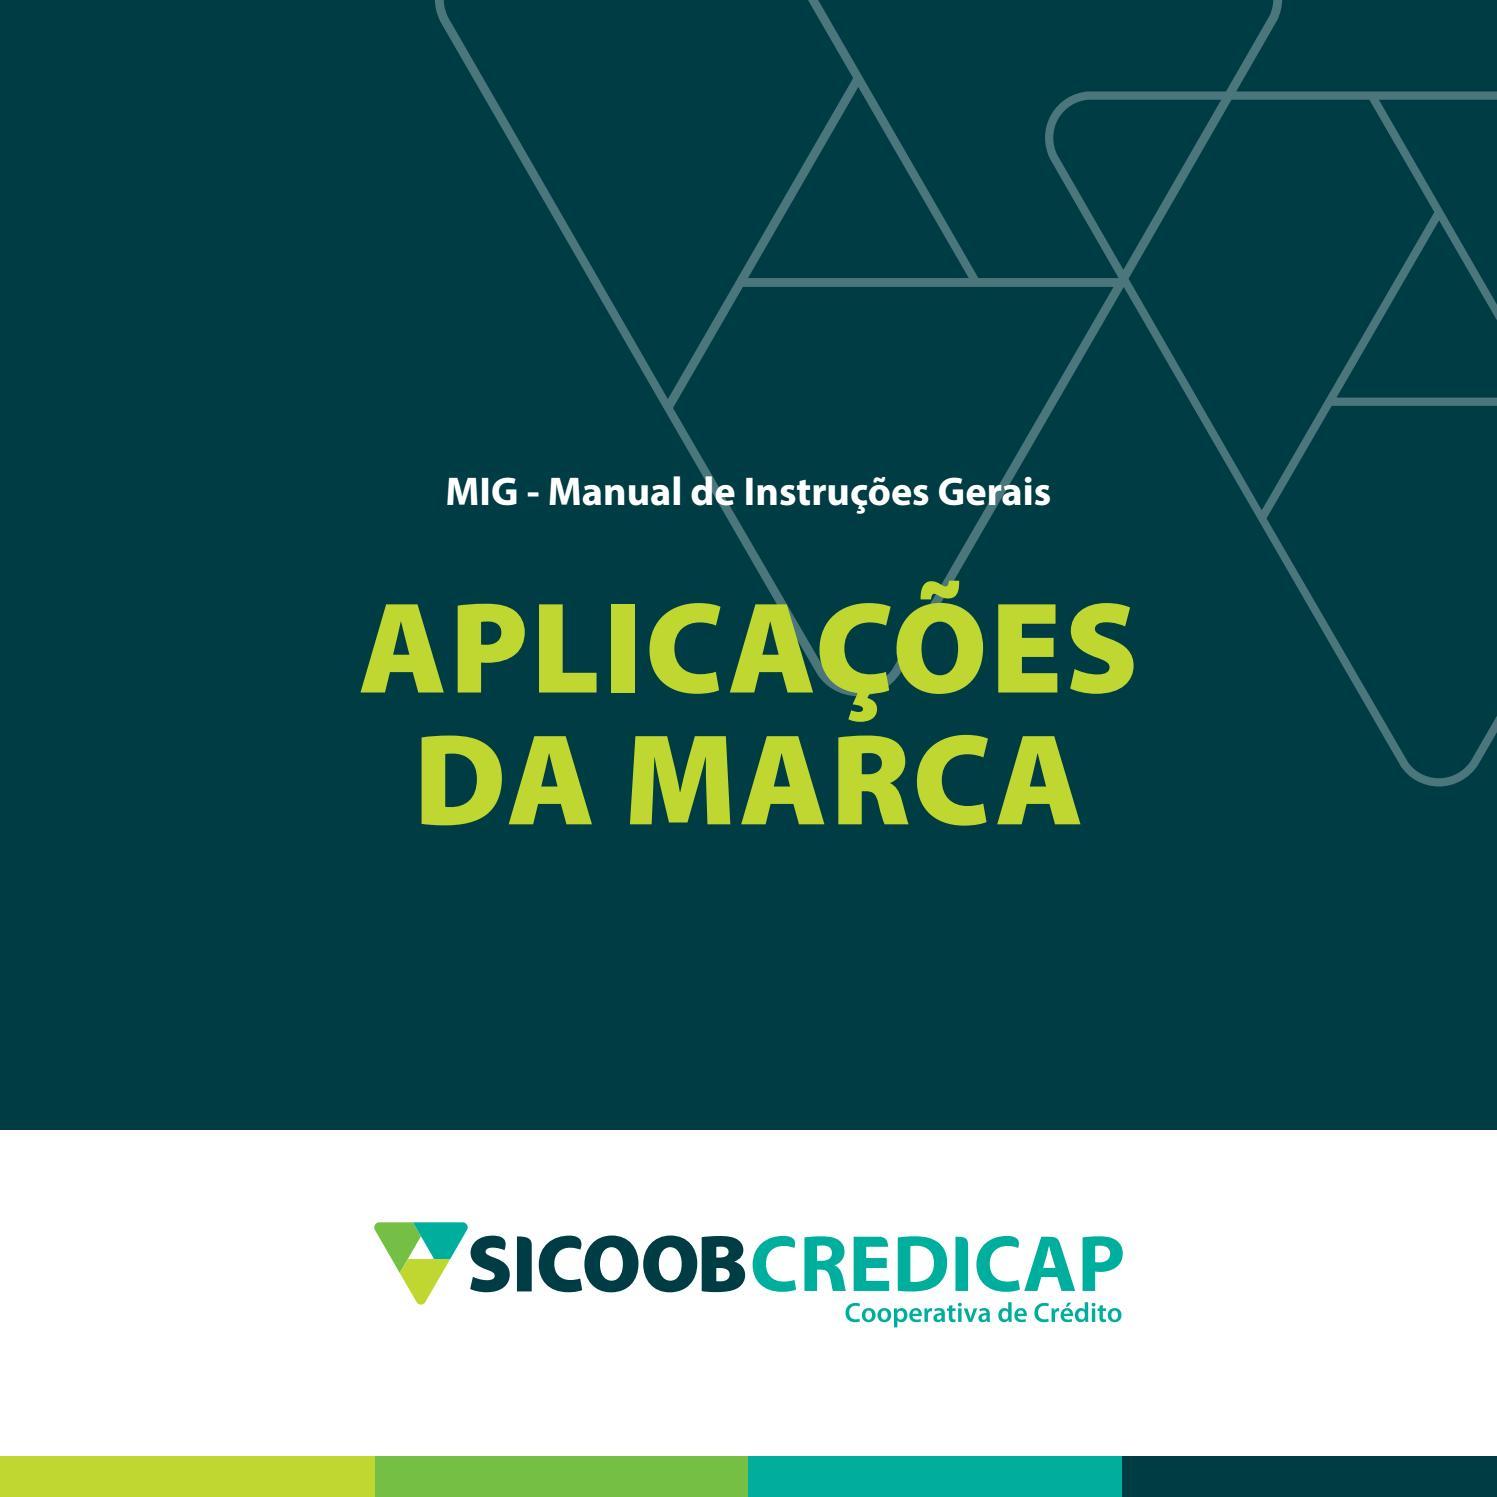 Sicoob credicap manual de aplicao da marca by zoommais issuu ccuart Gallery